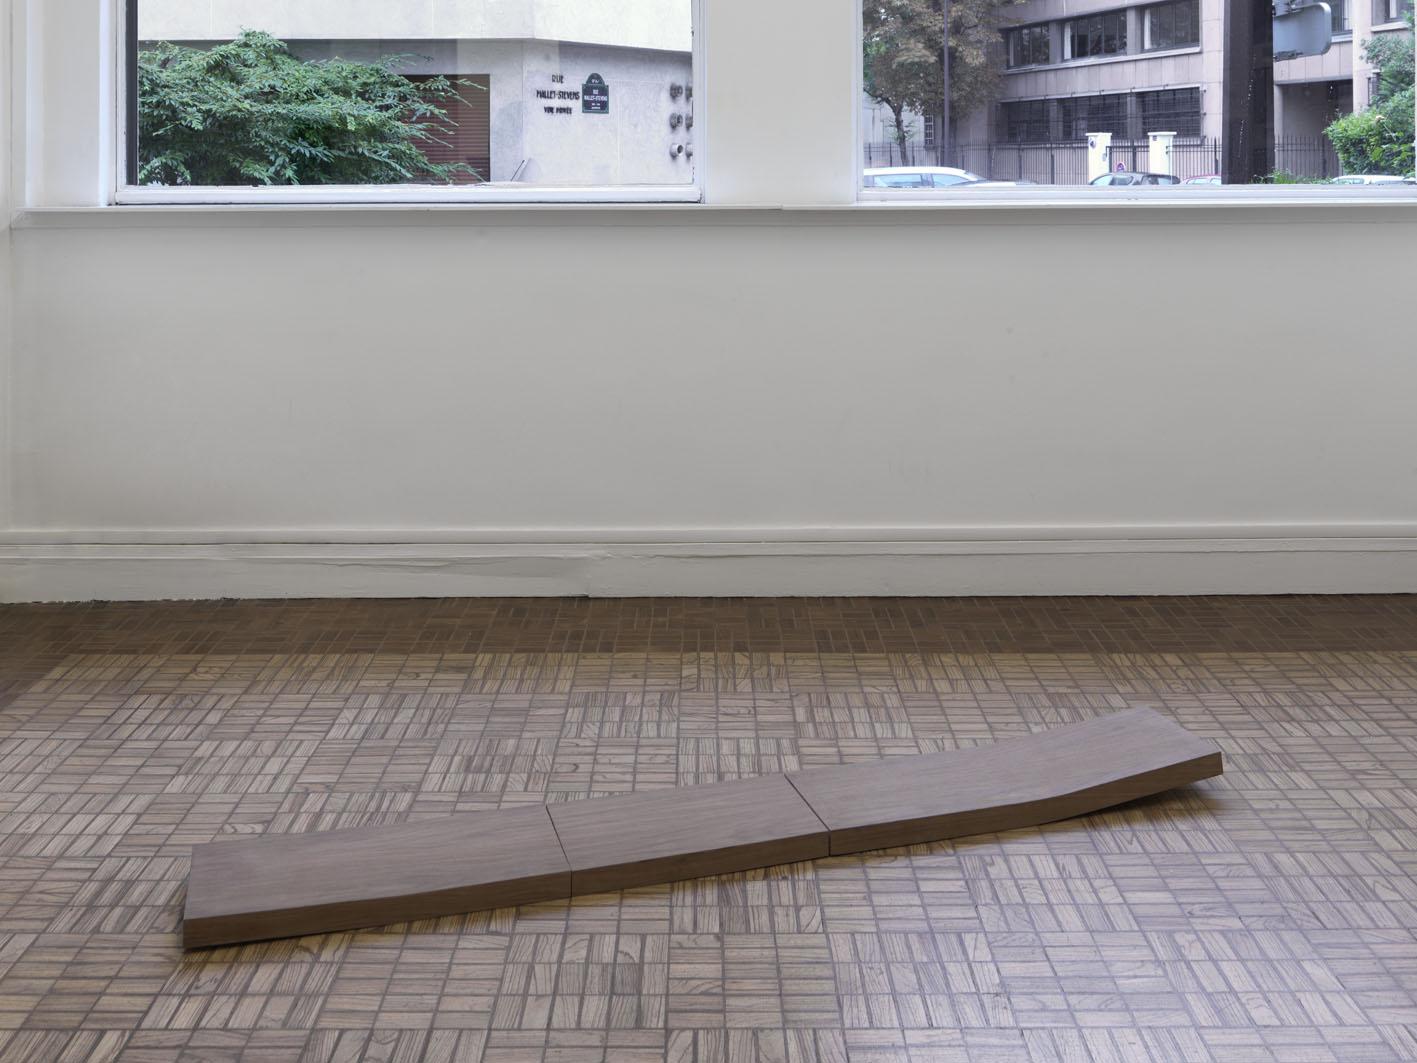 Becky Beasley Plank III (Covering Ground), 2008